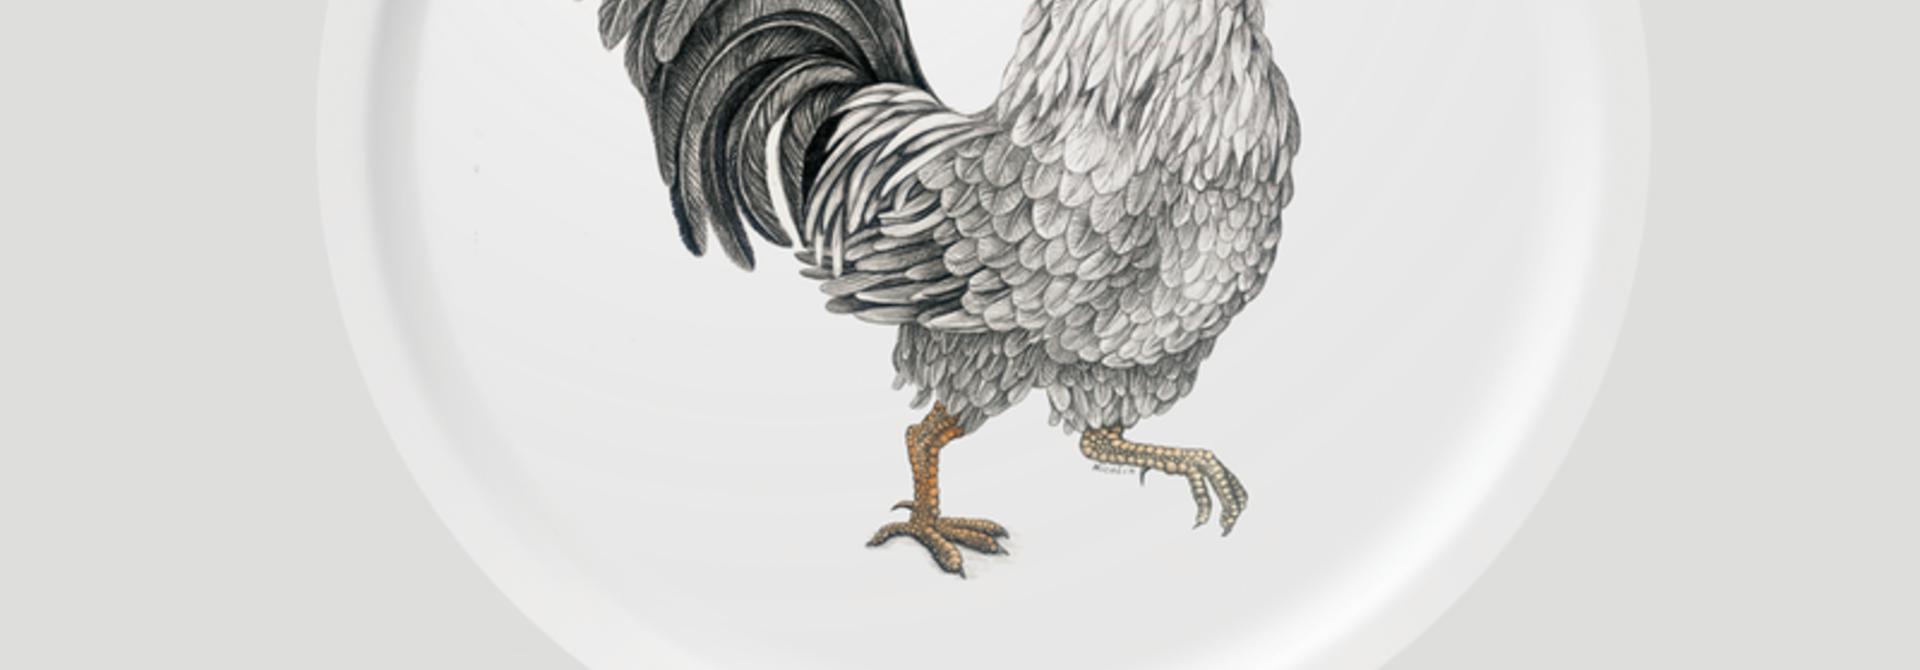 Circular Tray - Ralph - Rooster